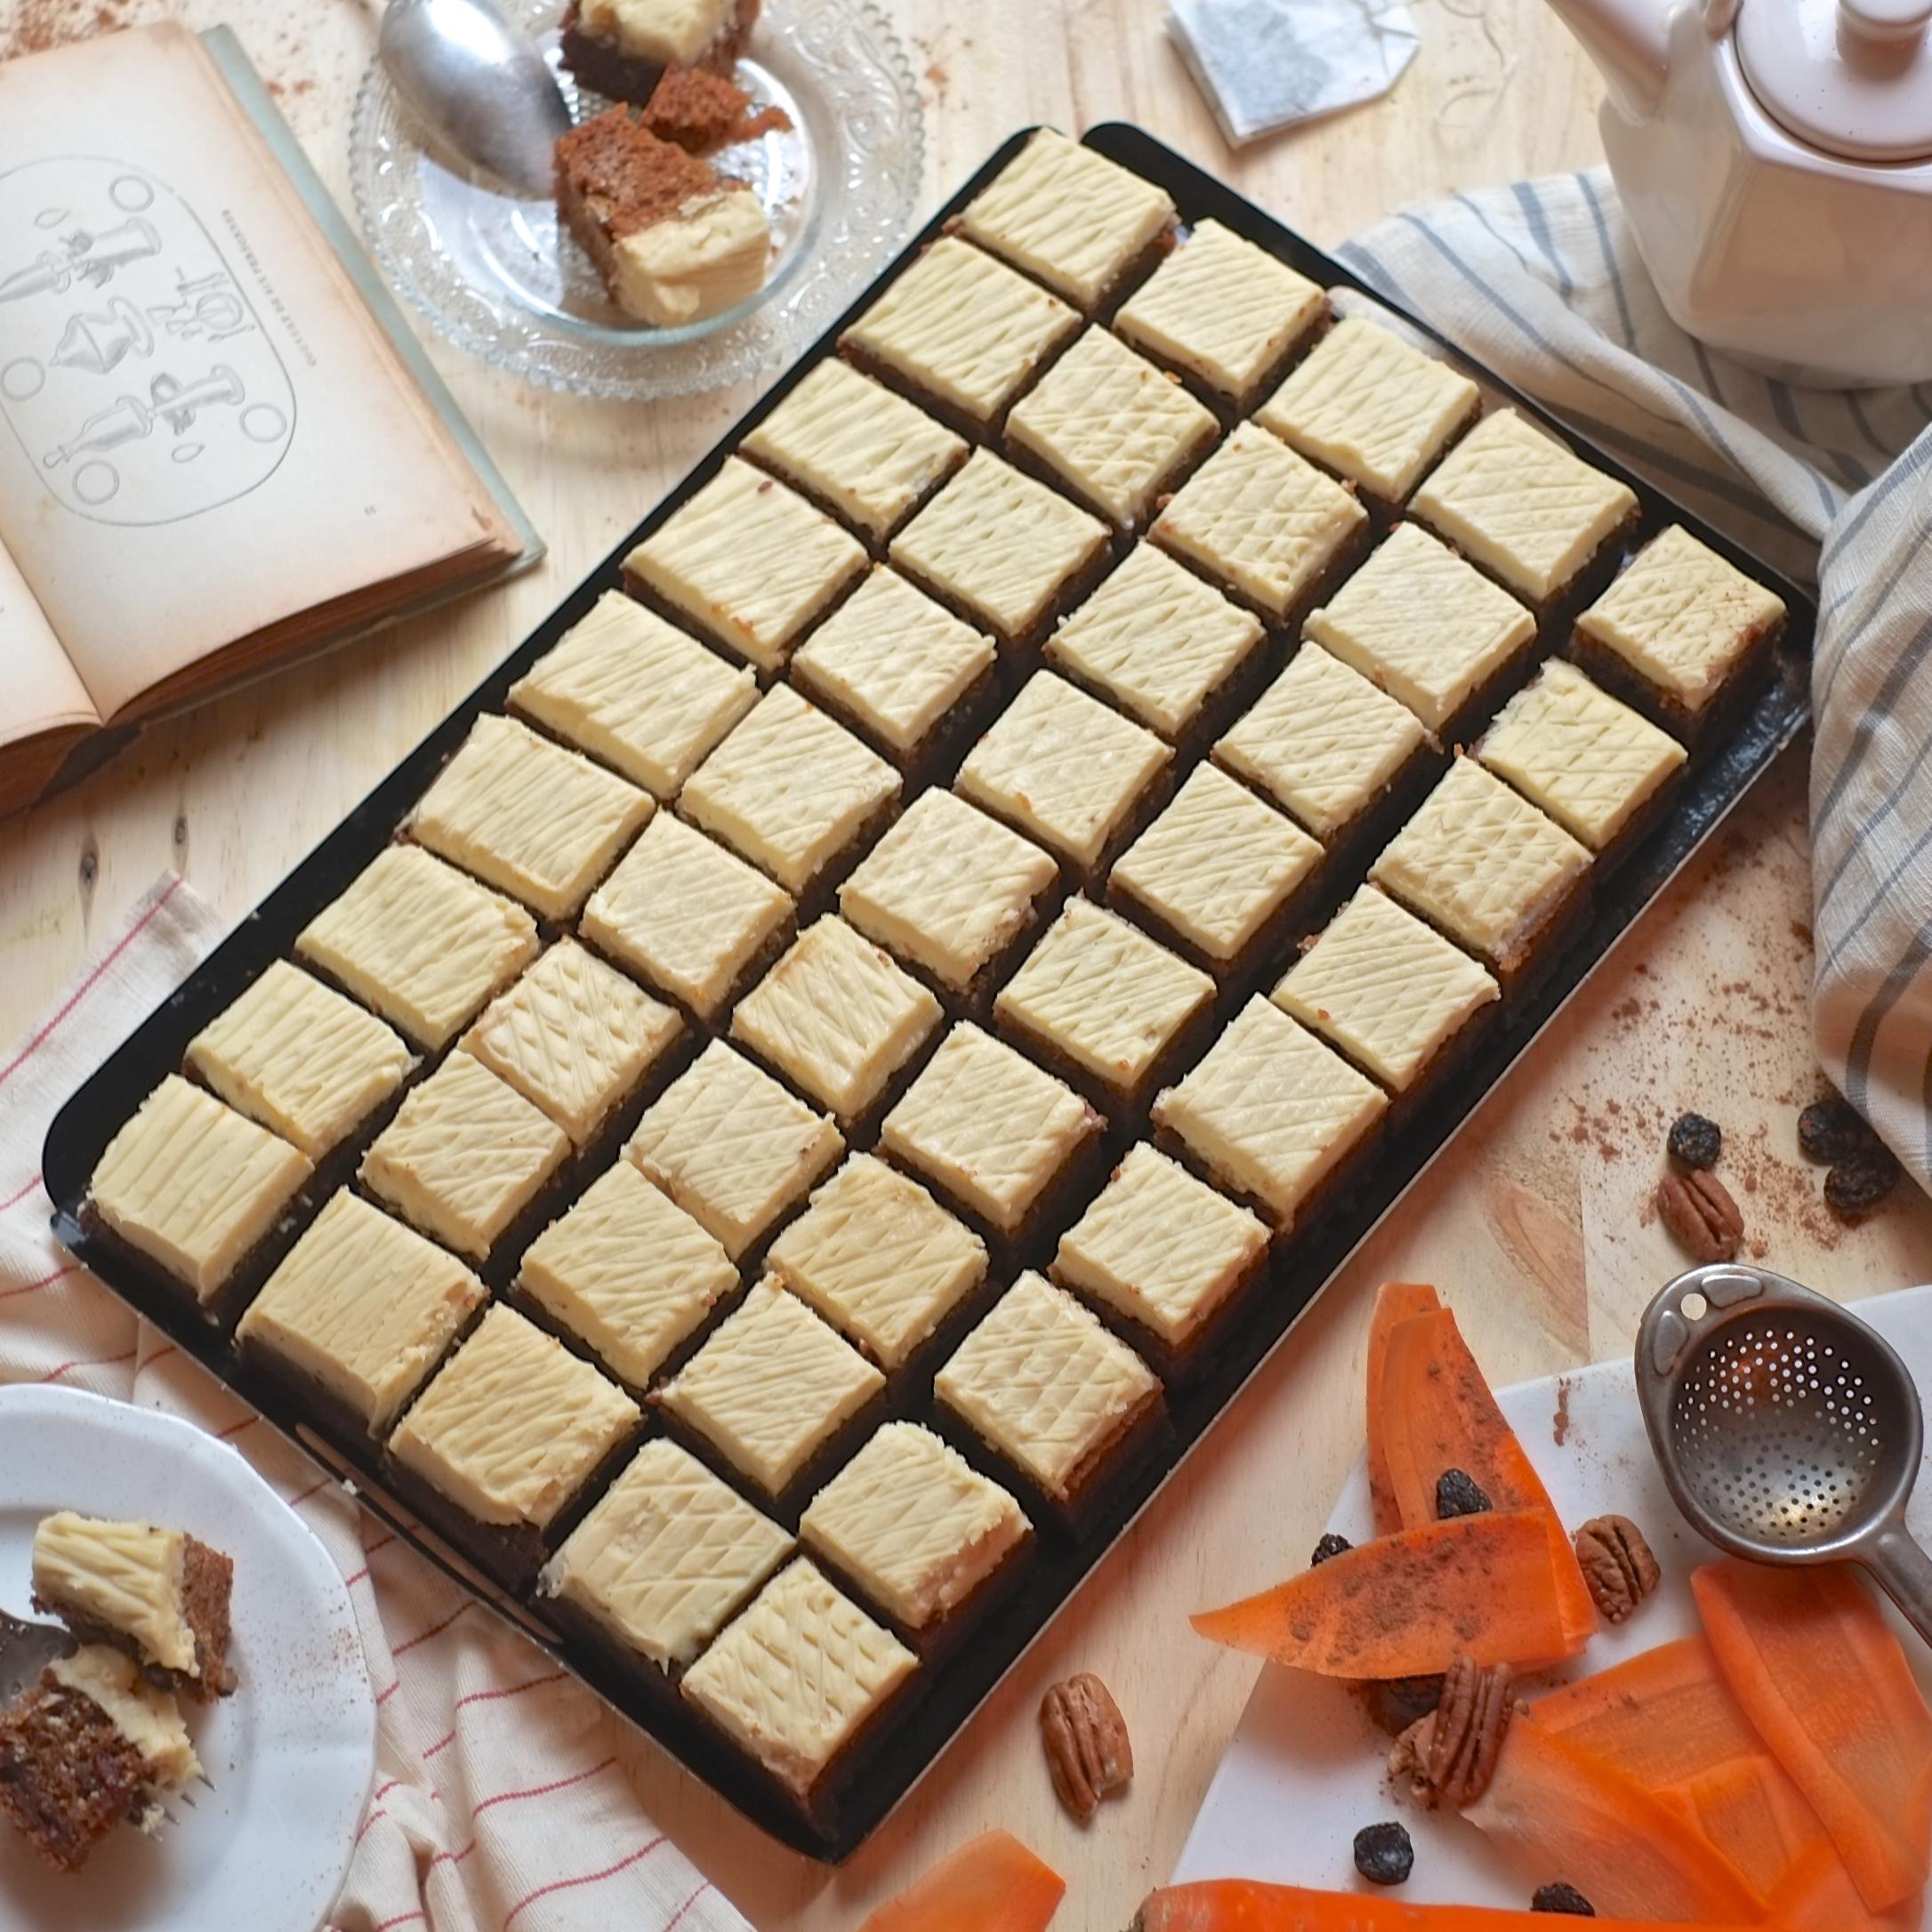 Grand carrot cake artisanal rectangulaire - 45 pièces (36 heures à l'avance)